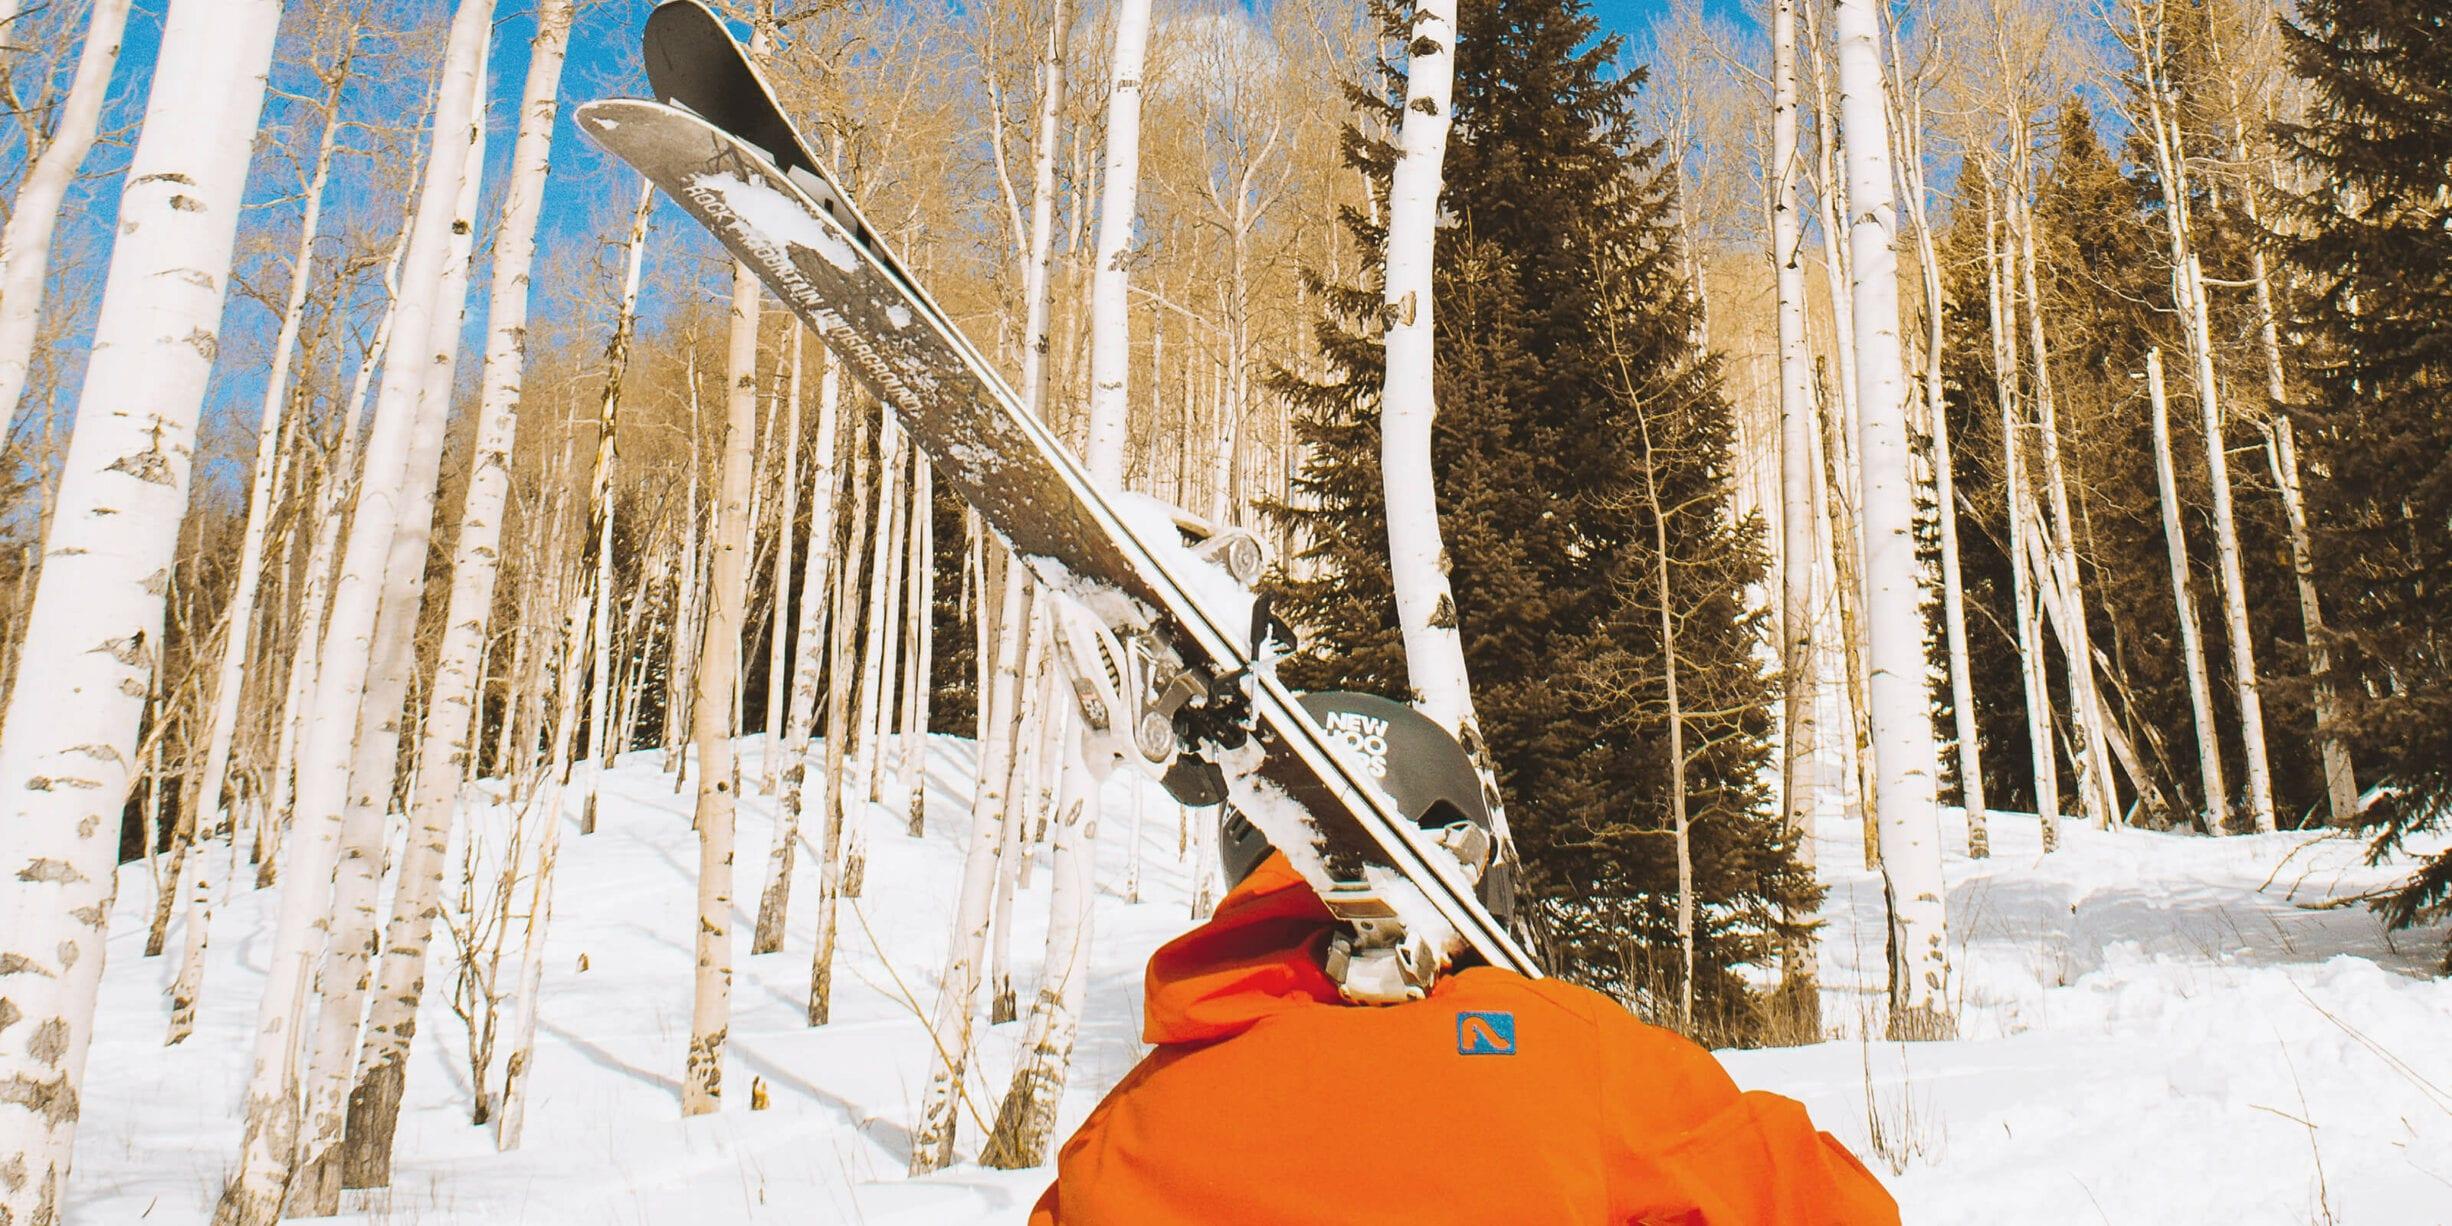 man carrying snowboard